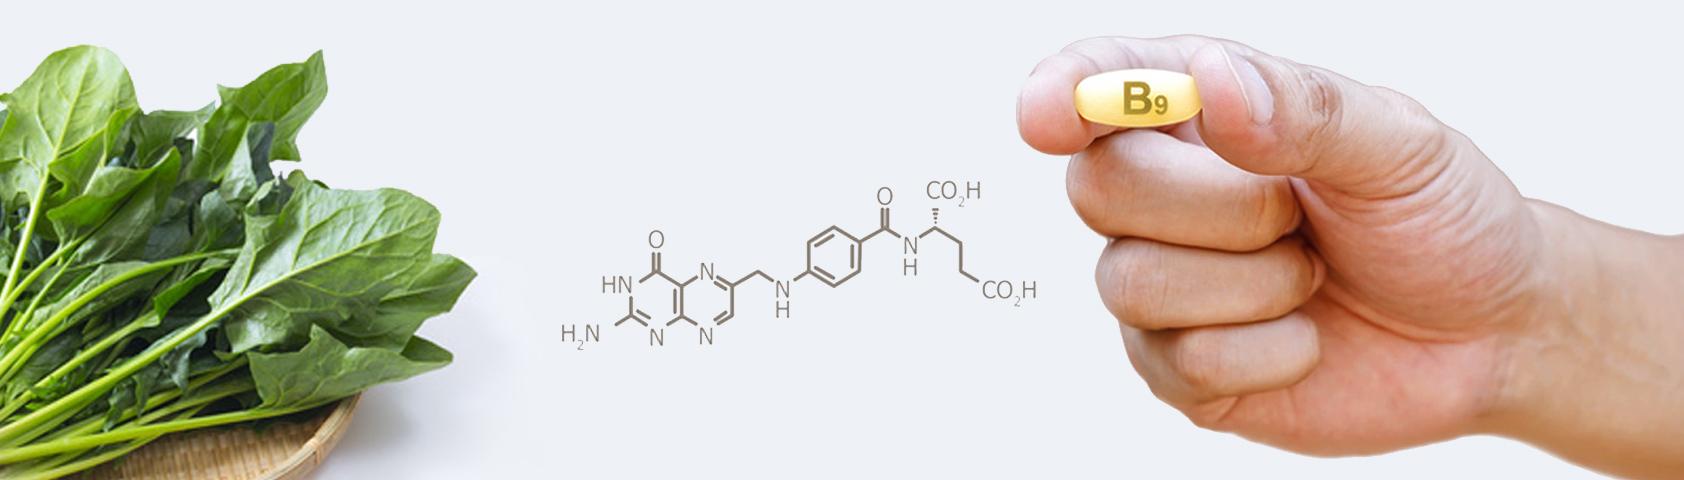 Folsäure/Vitamin B